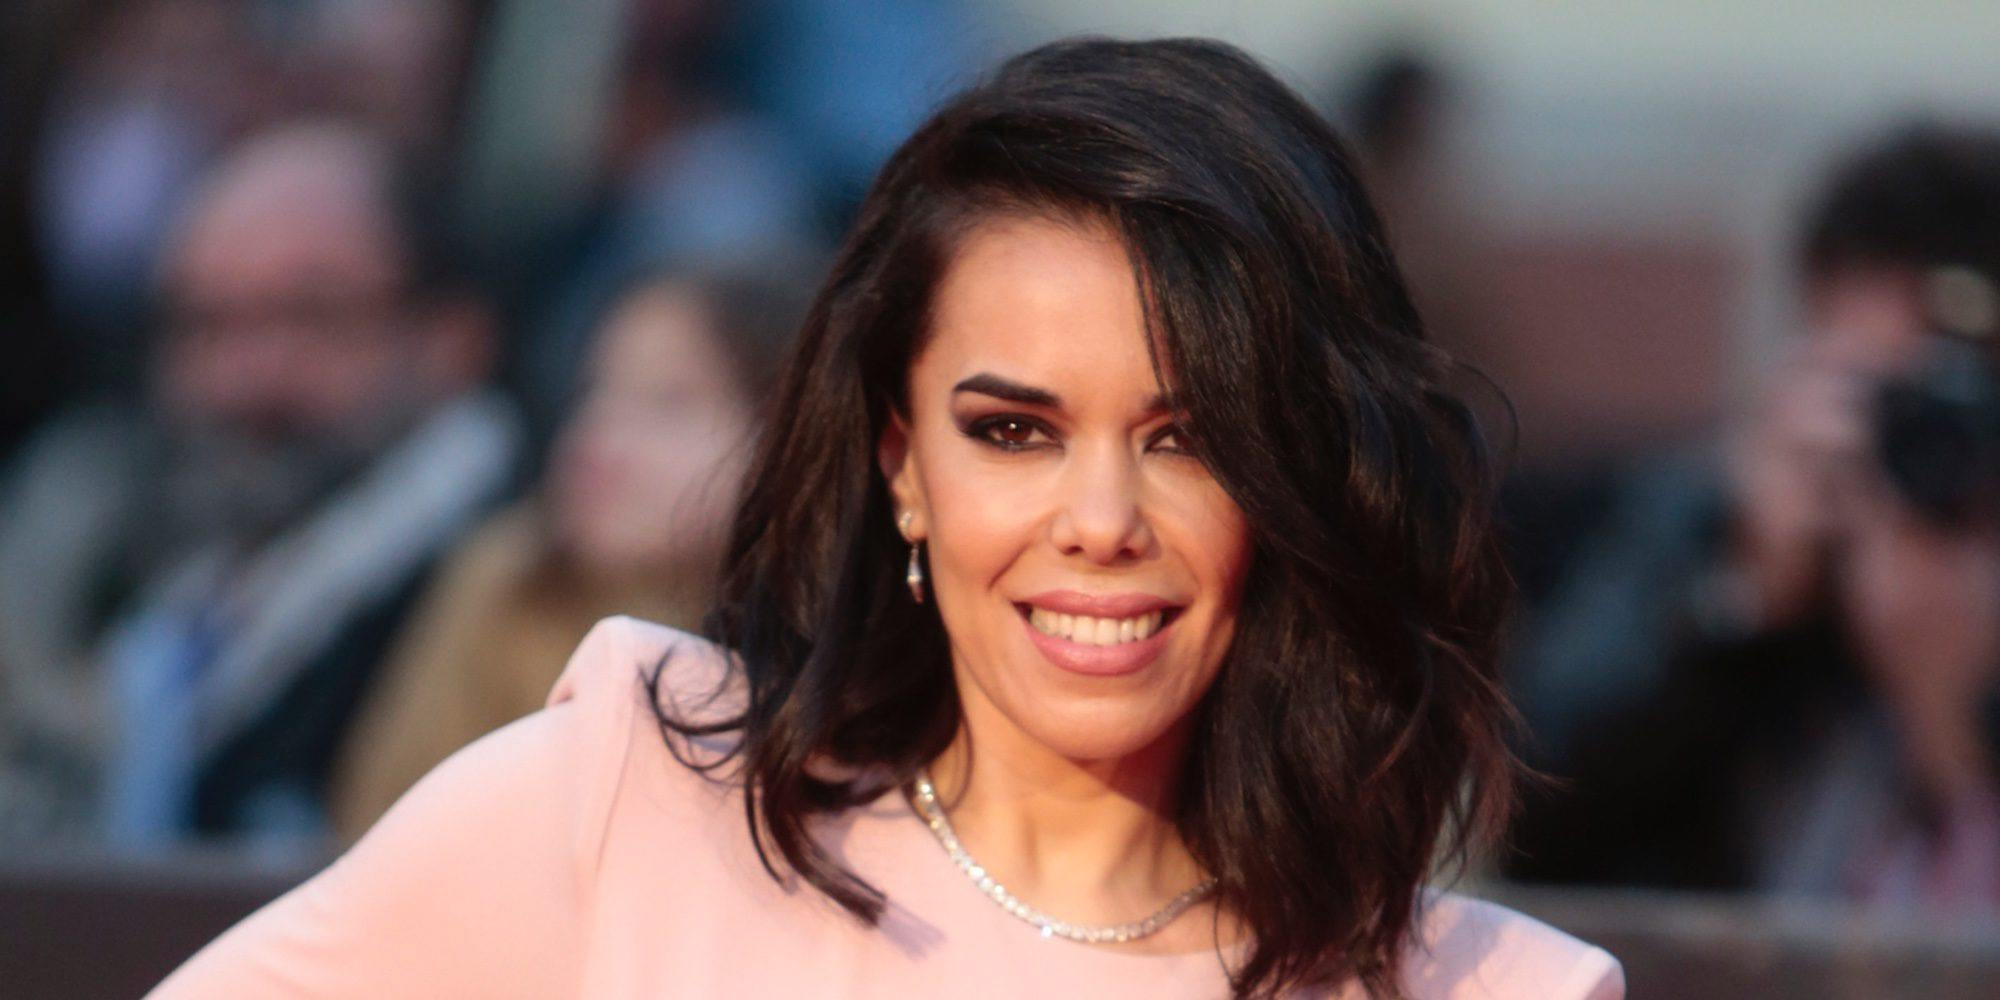 Beatriz Luengo: 35 curiosidades que quizás no sabías de esta exitosa cantante